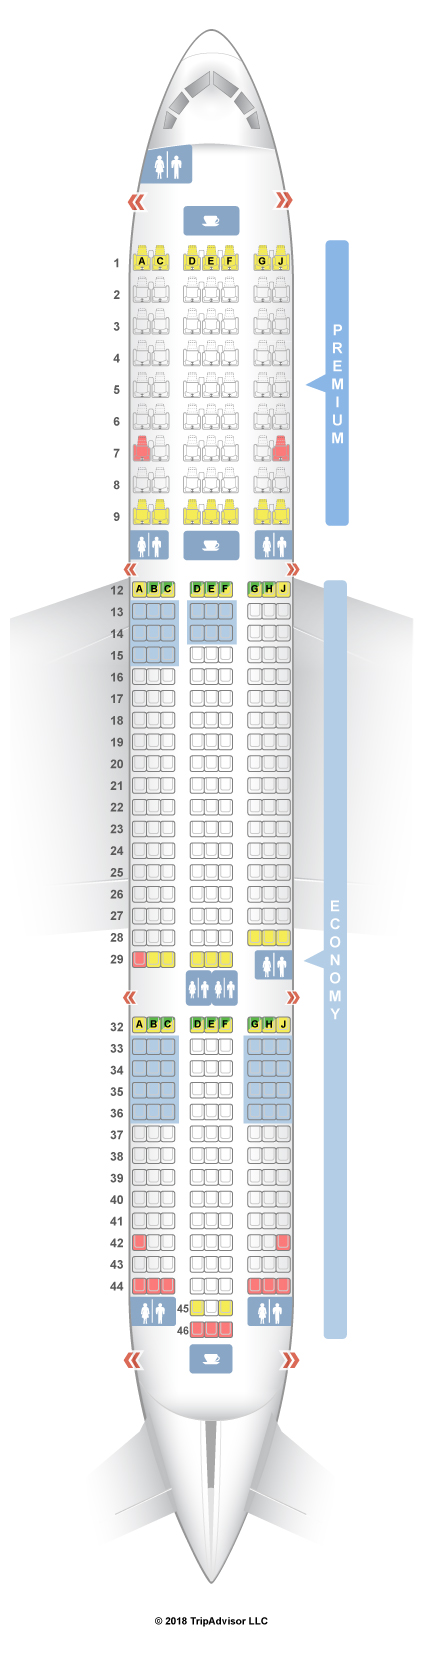 Seatguru Seat Map Thomson Boeing 787 9 789